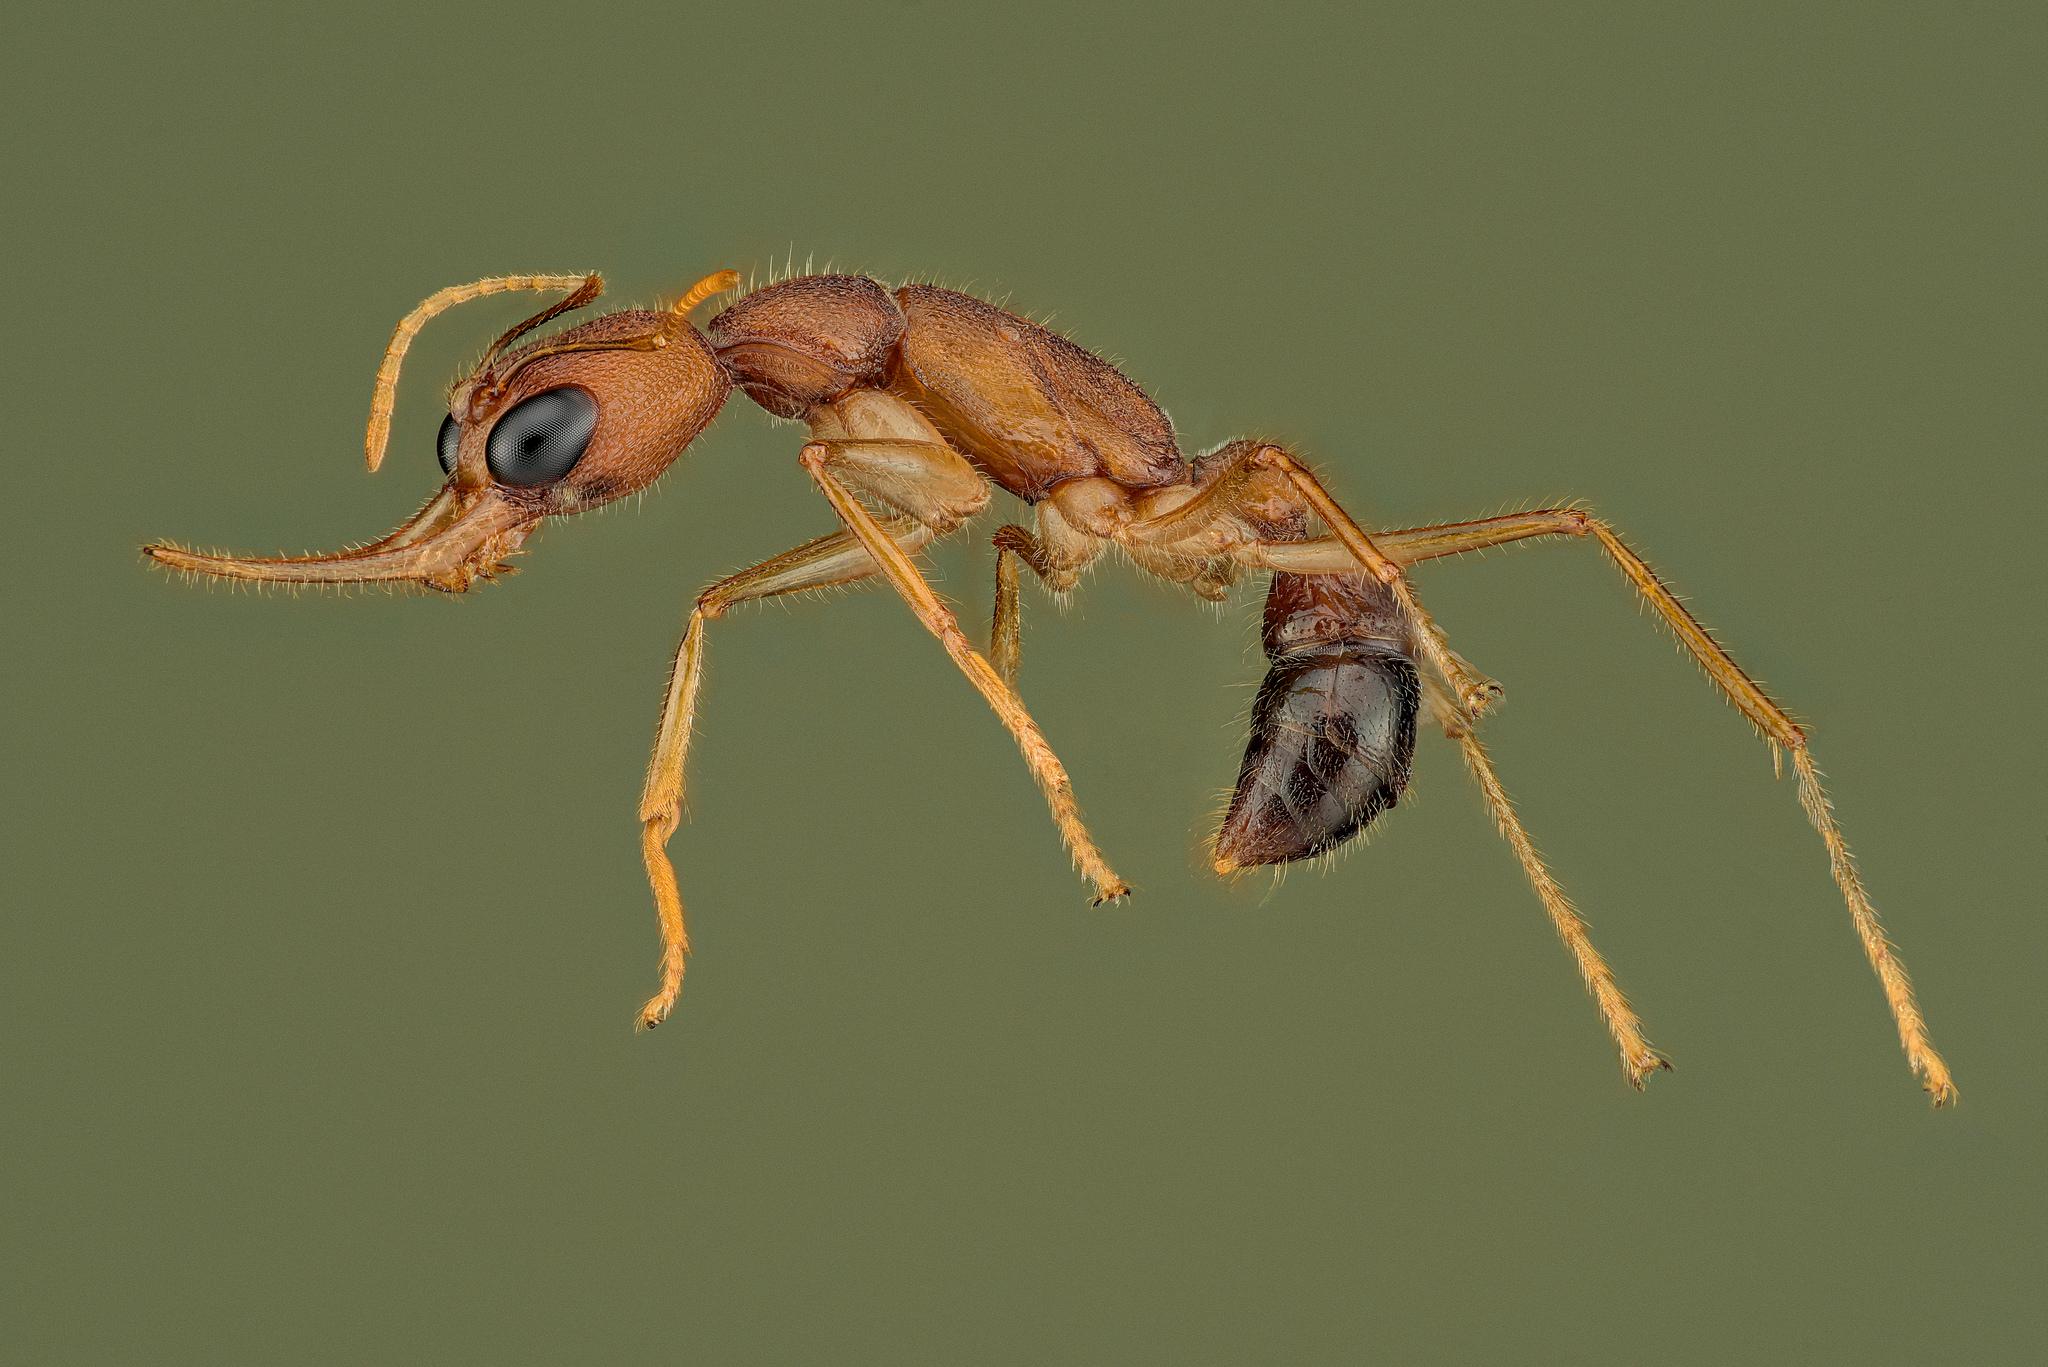 Una hormiga saltando - 2048x1367